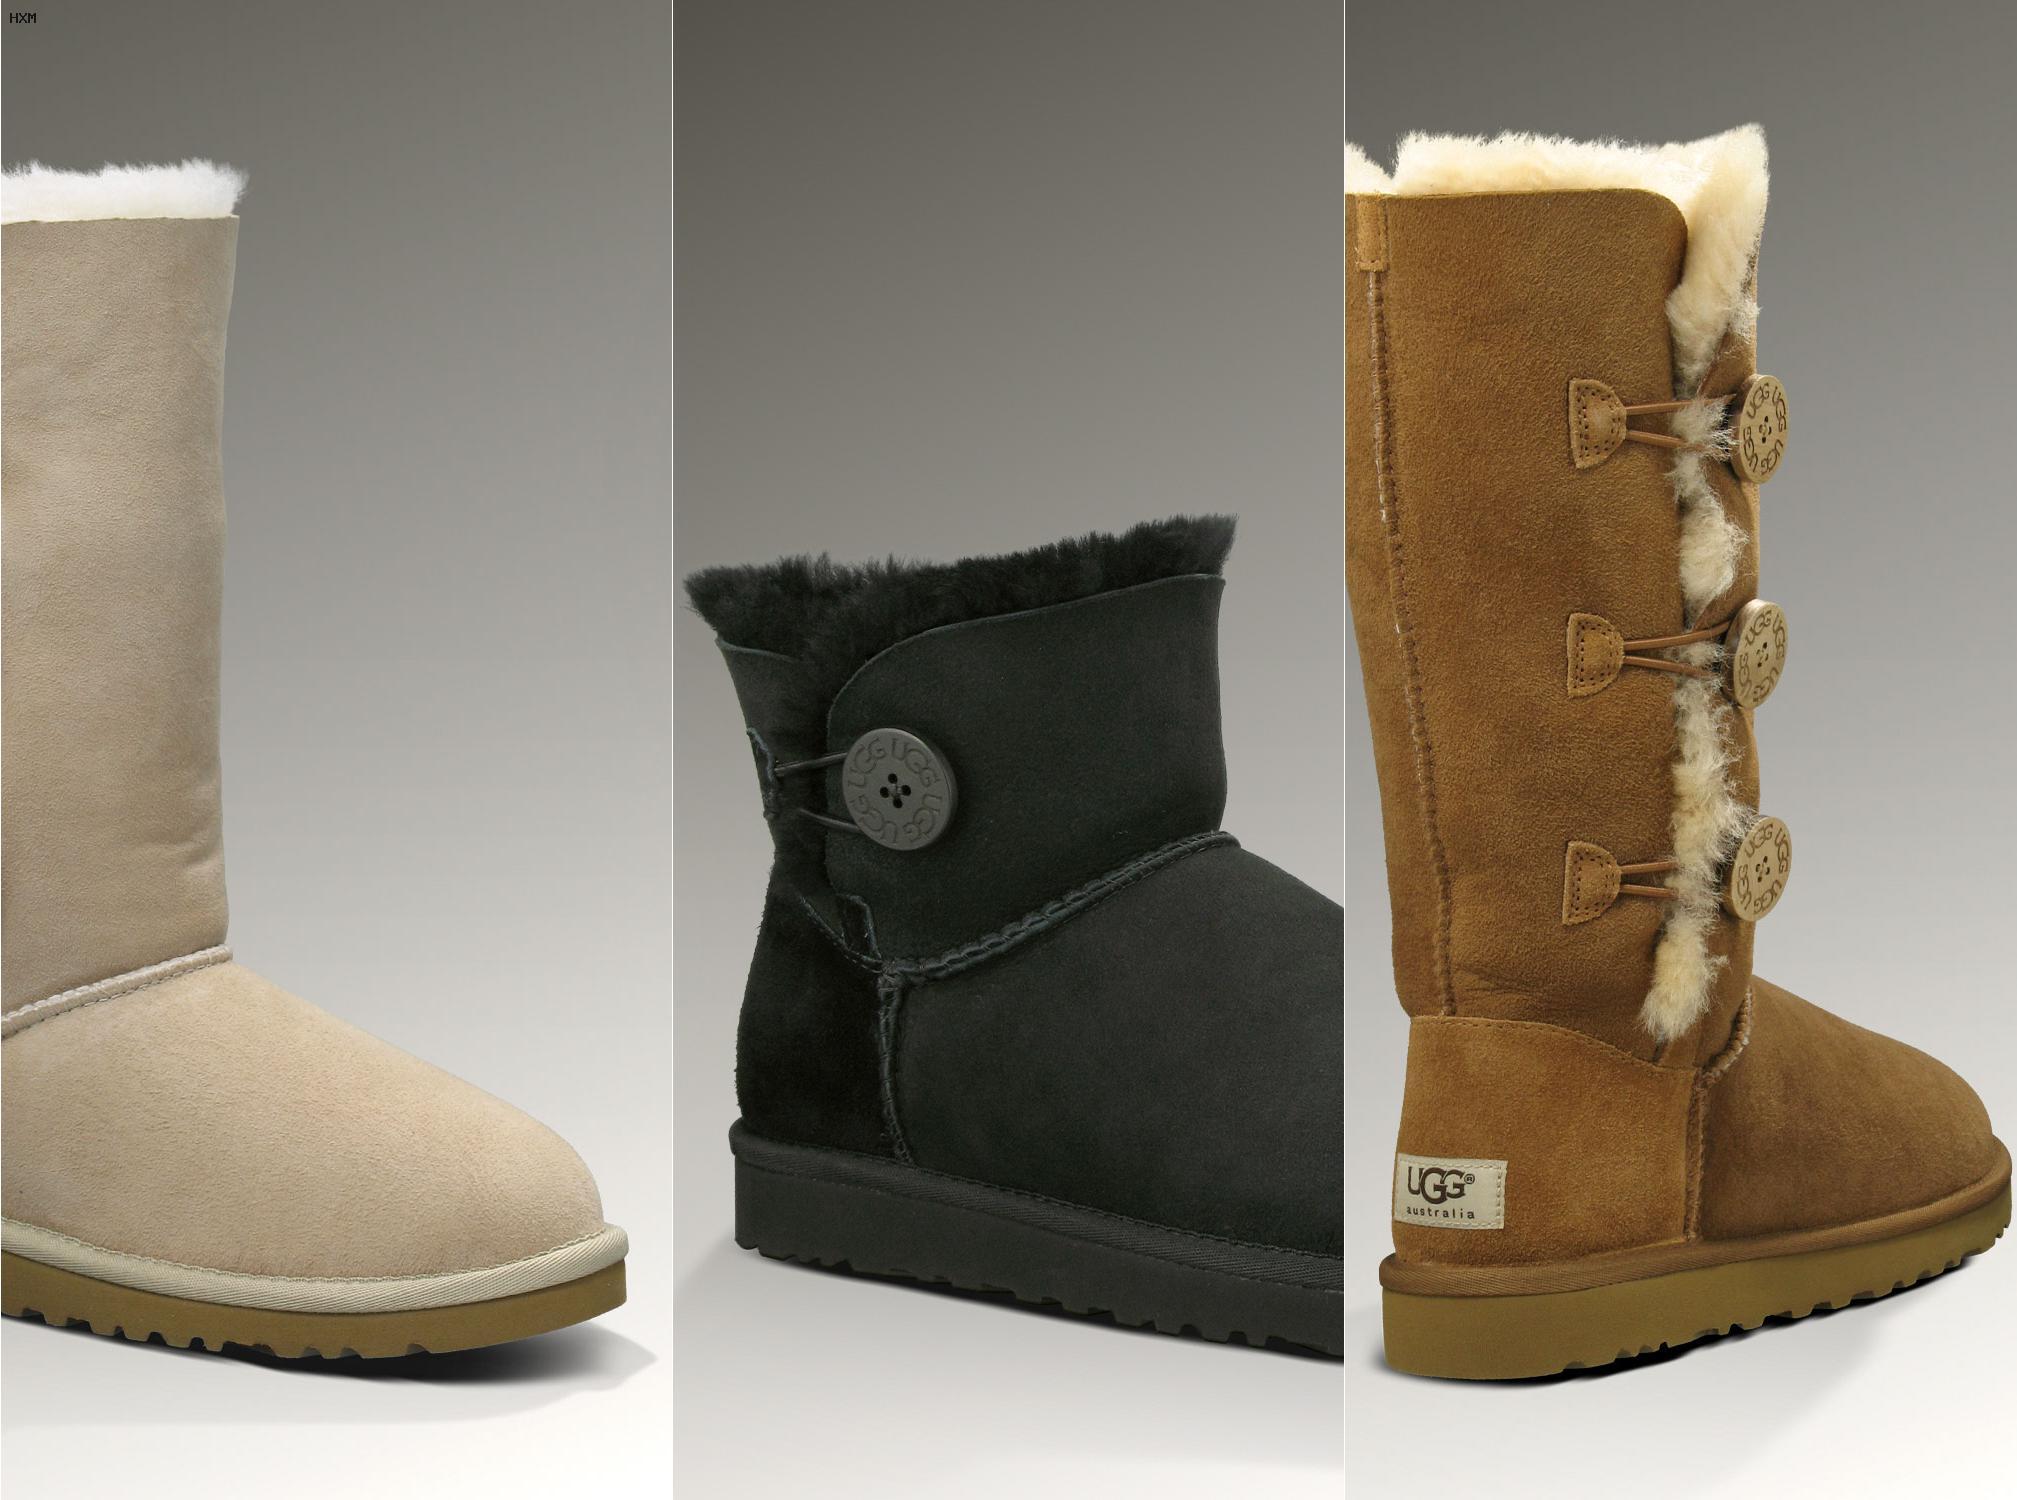 precio botas ugg en australia